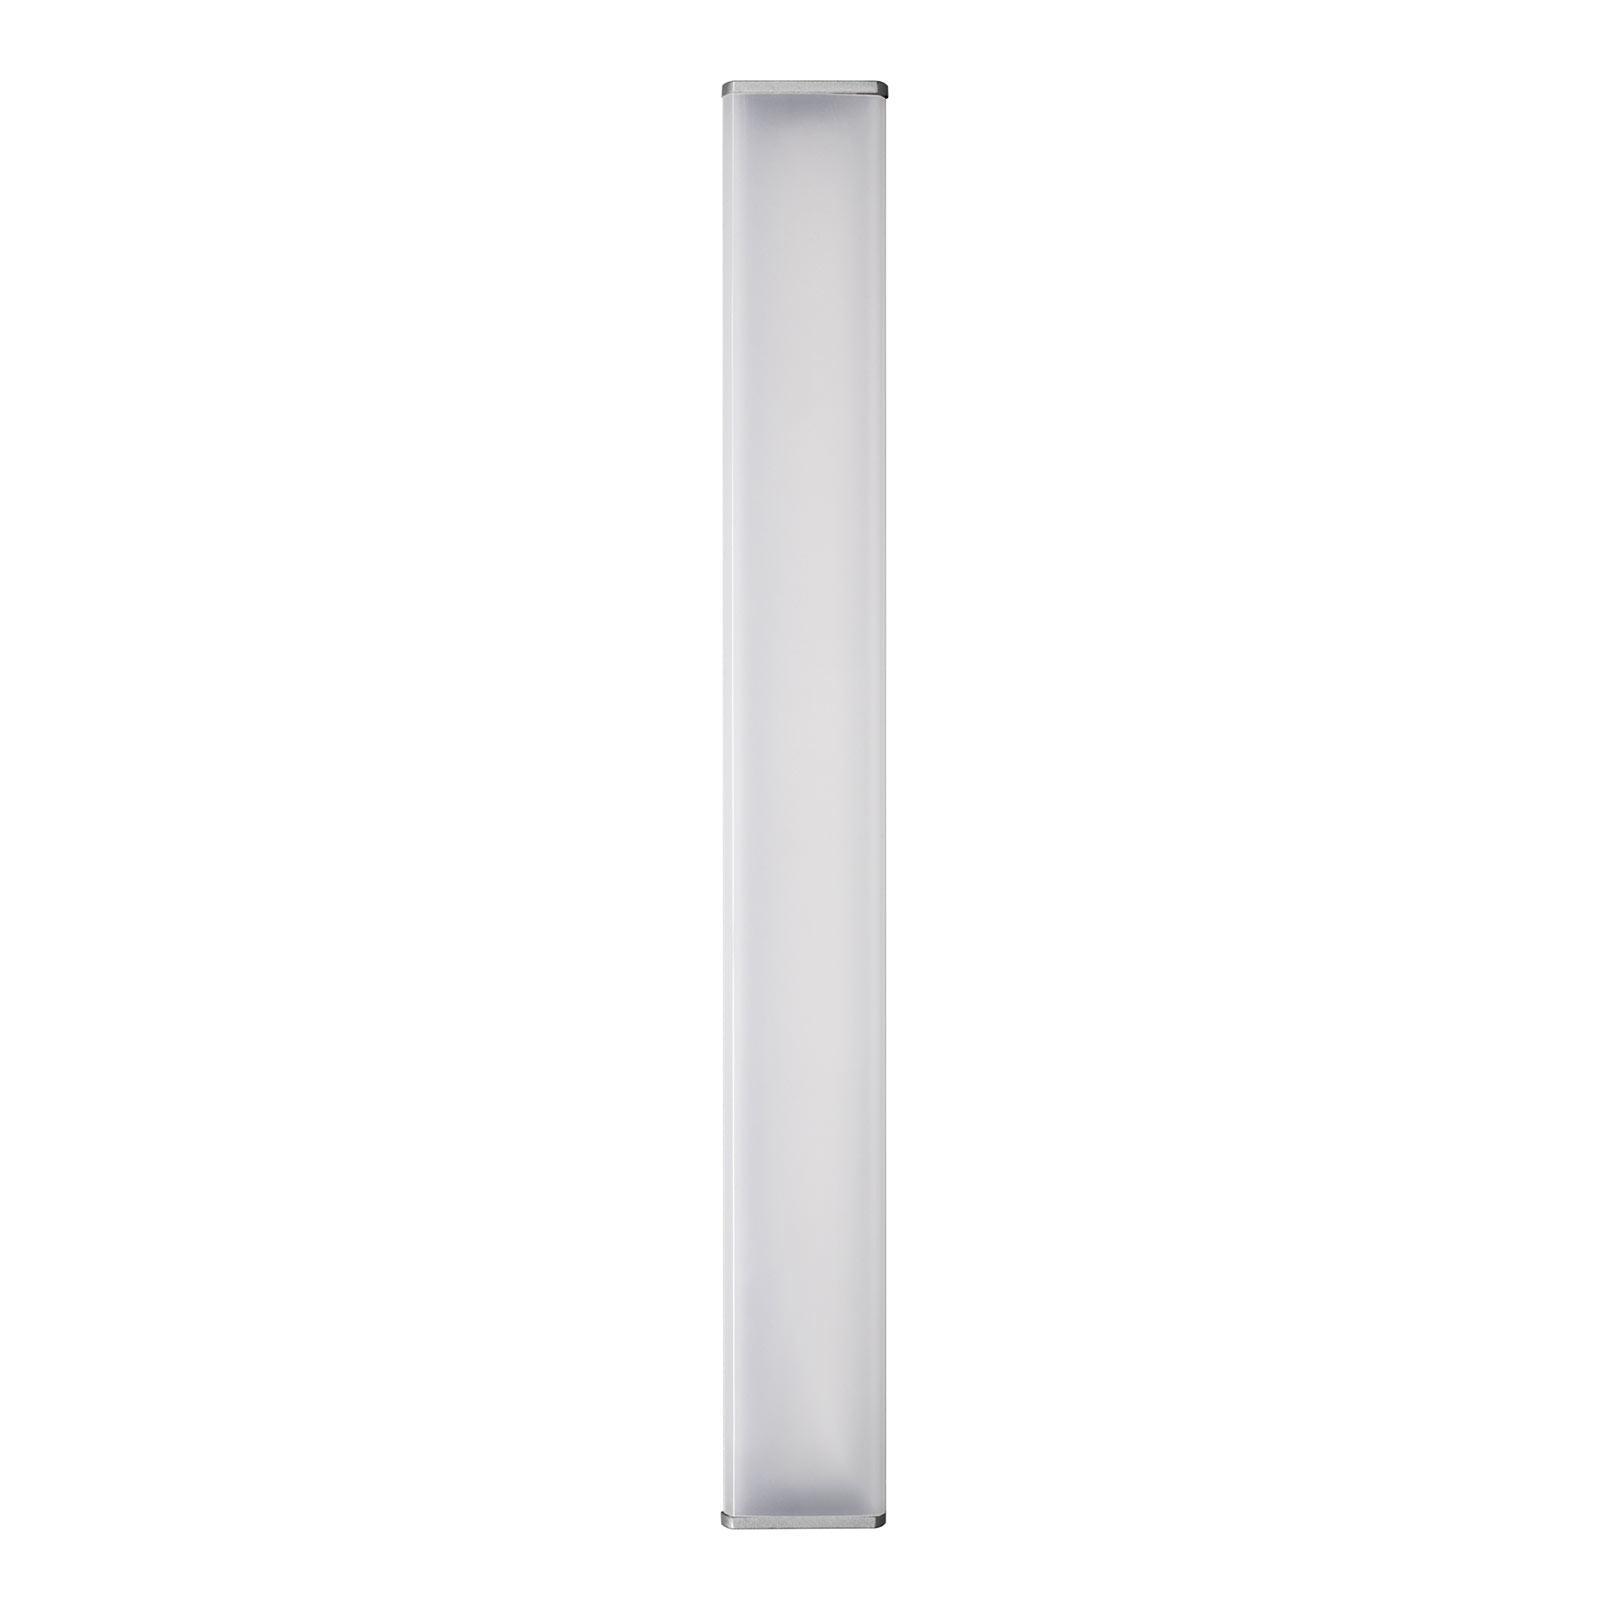 LEDVANCE Cabinet Corner -kaapinalusvalaisin 35 cm